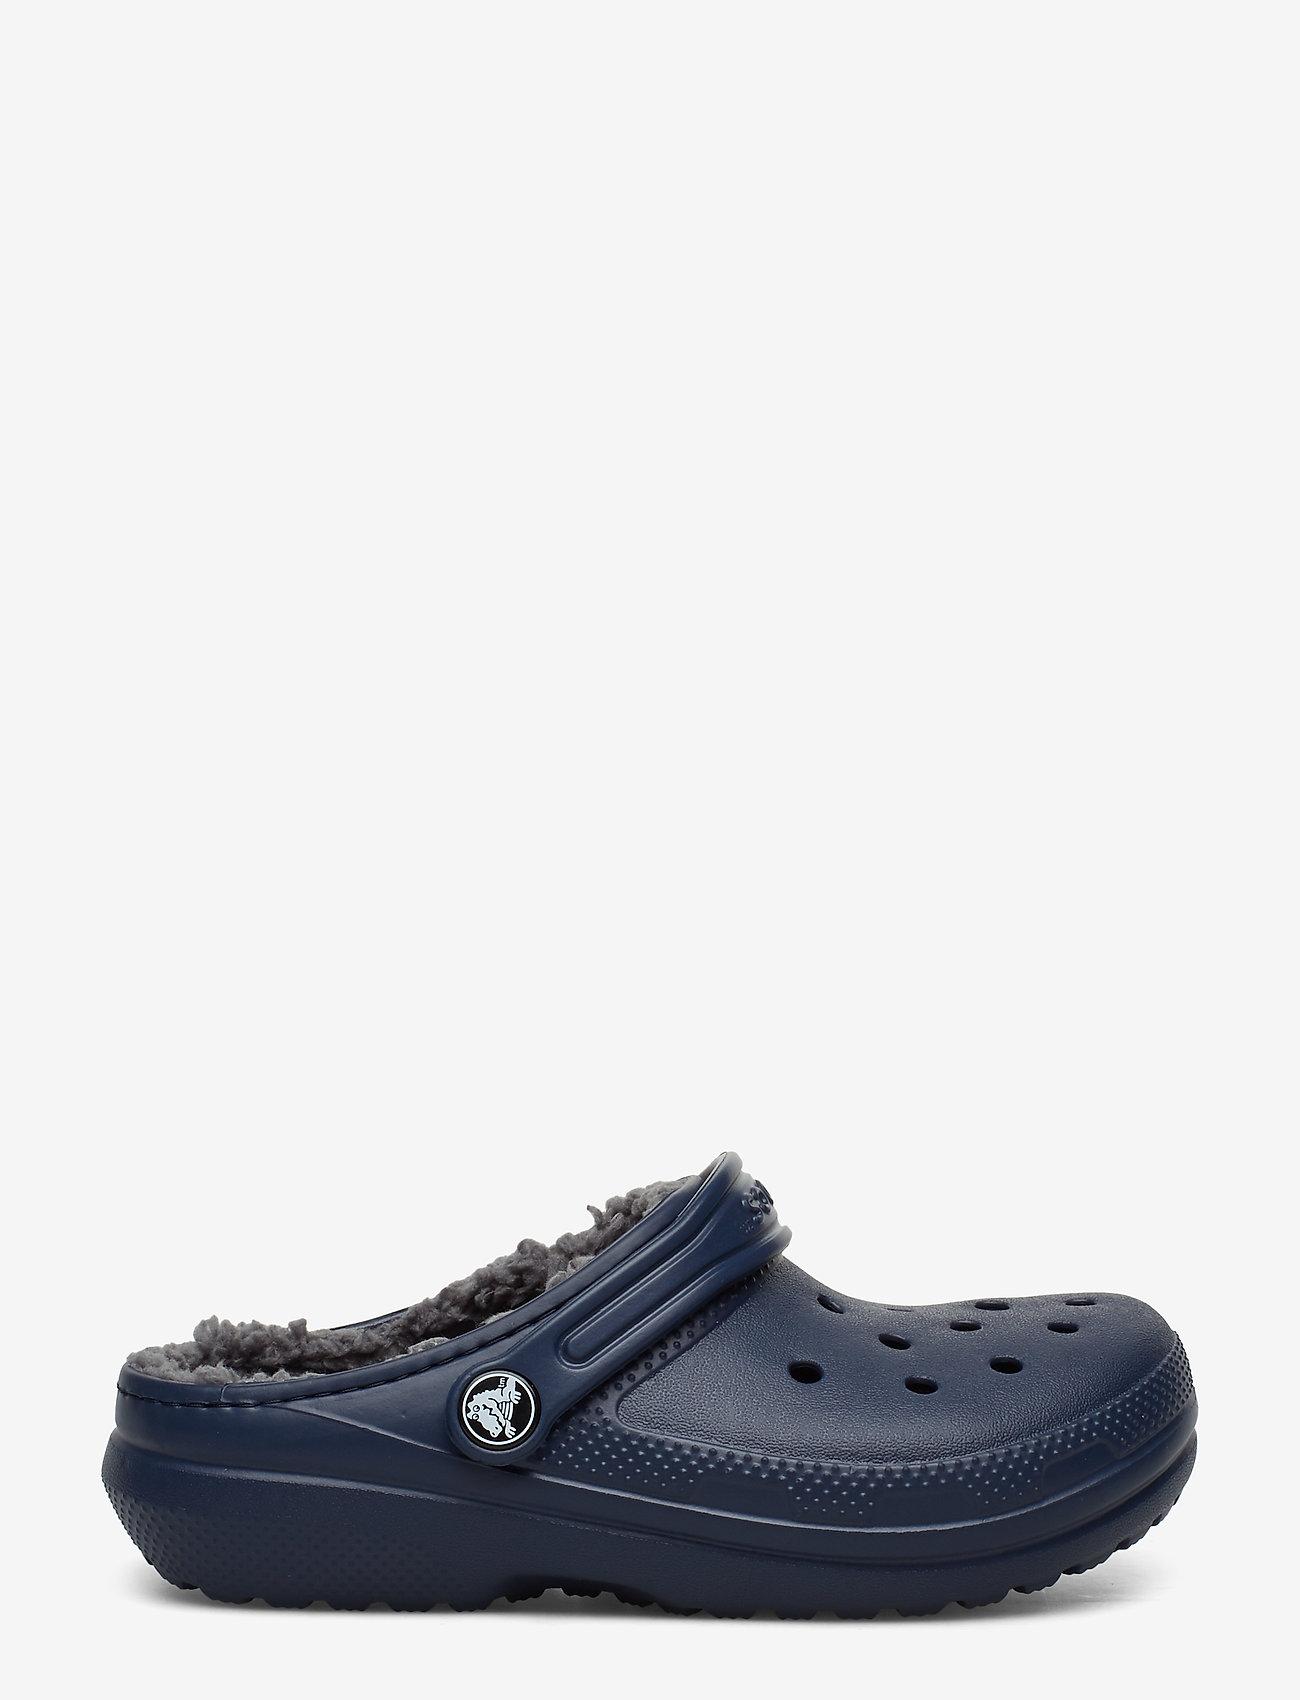 Crocs - Classic Lined Clog K - navy/charcoal - 1